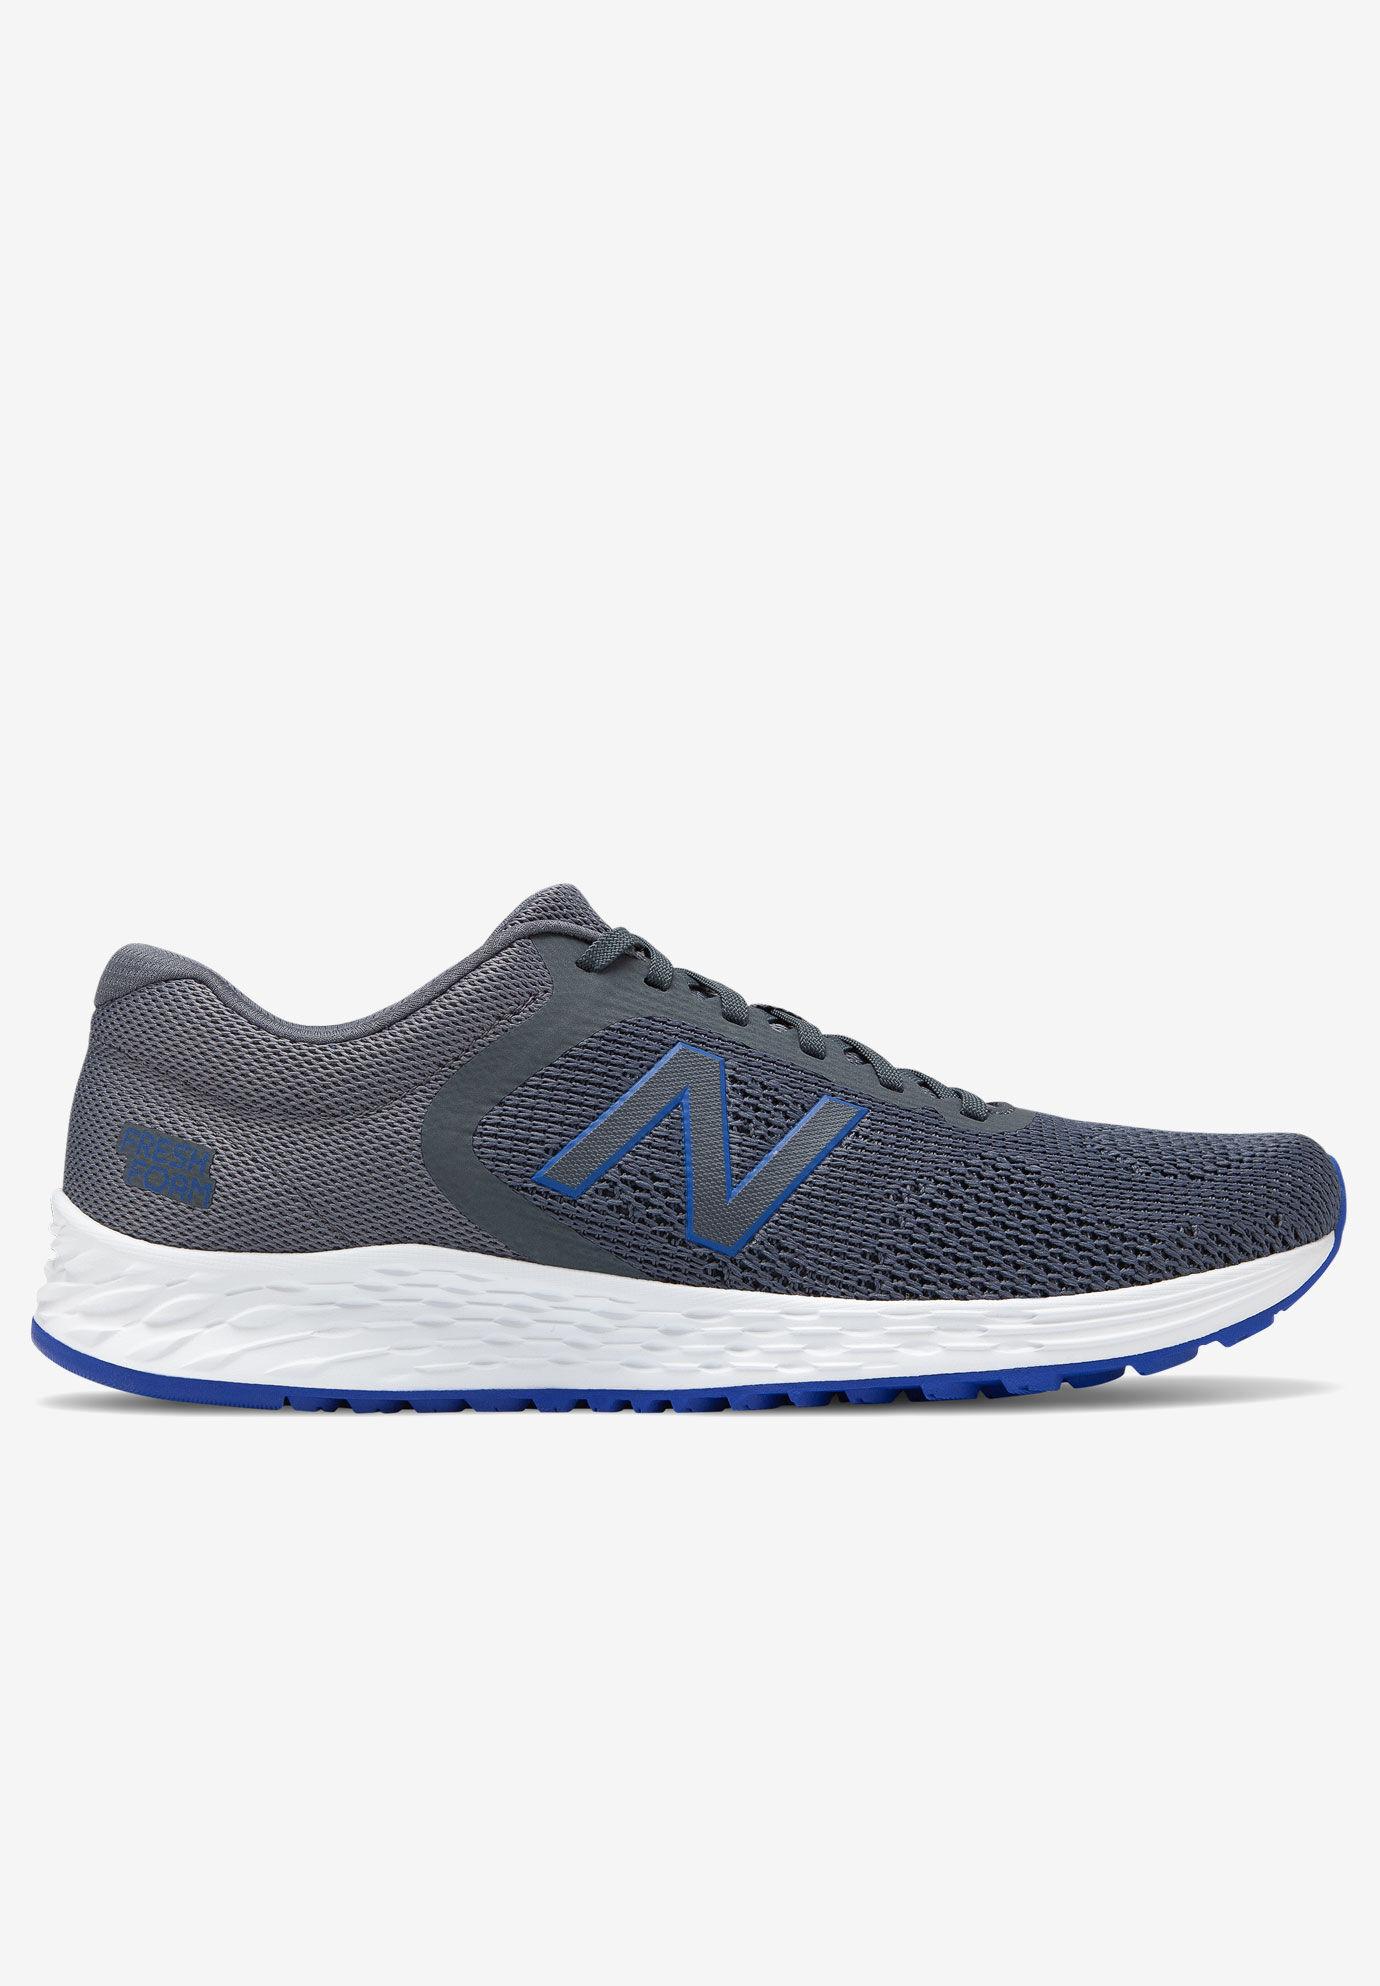 chaussure new balance mw 620 graphics